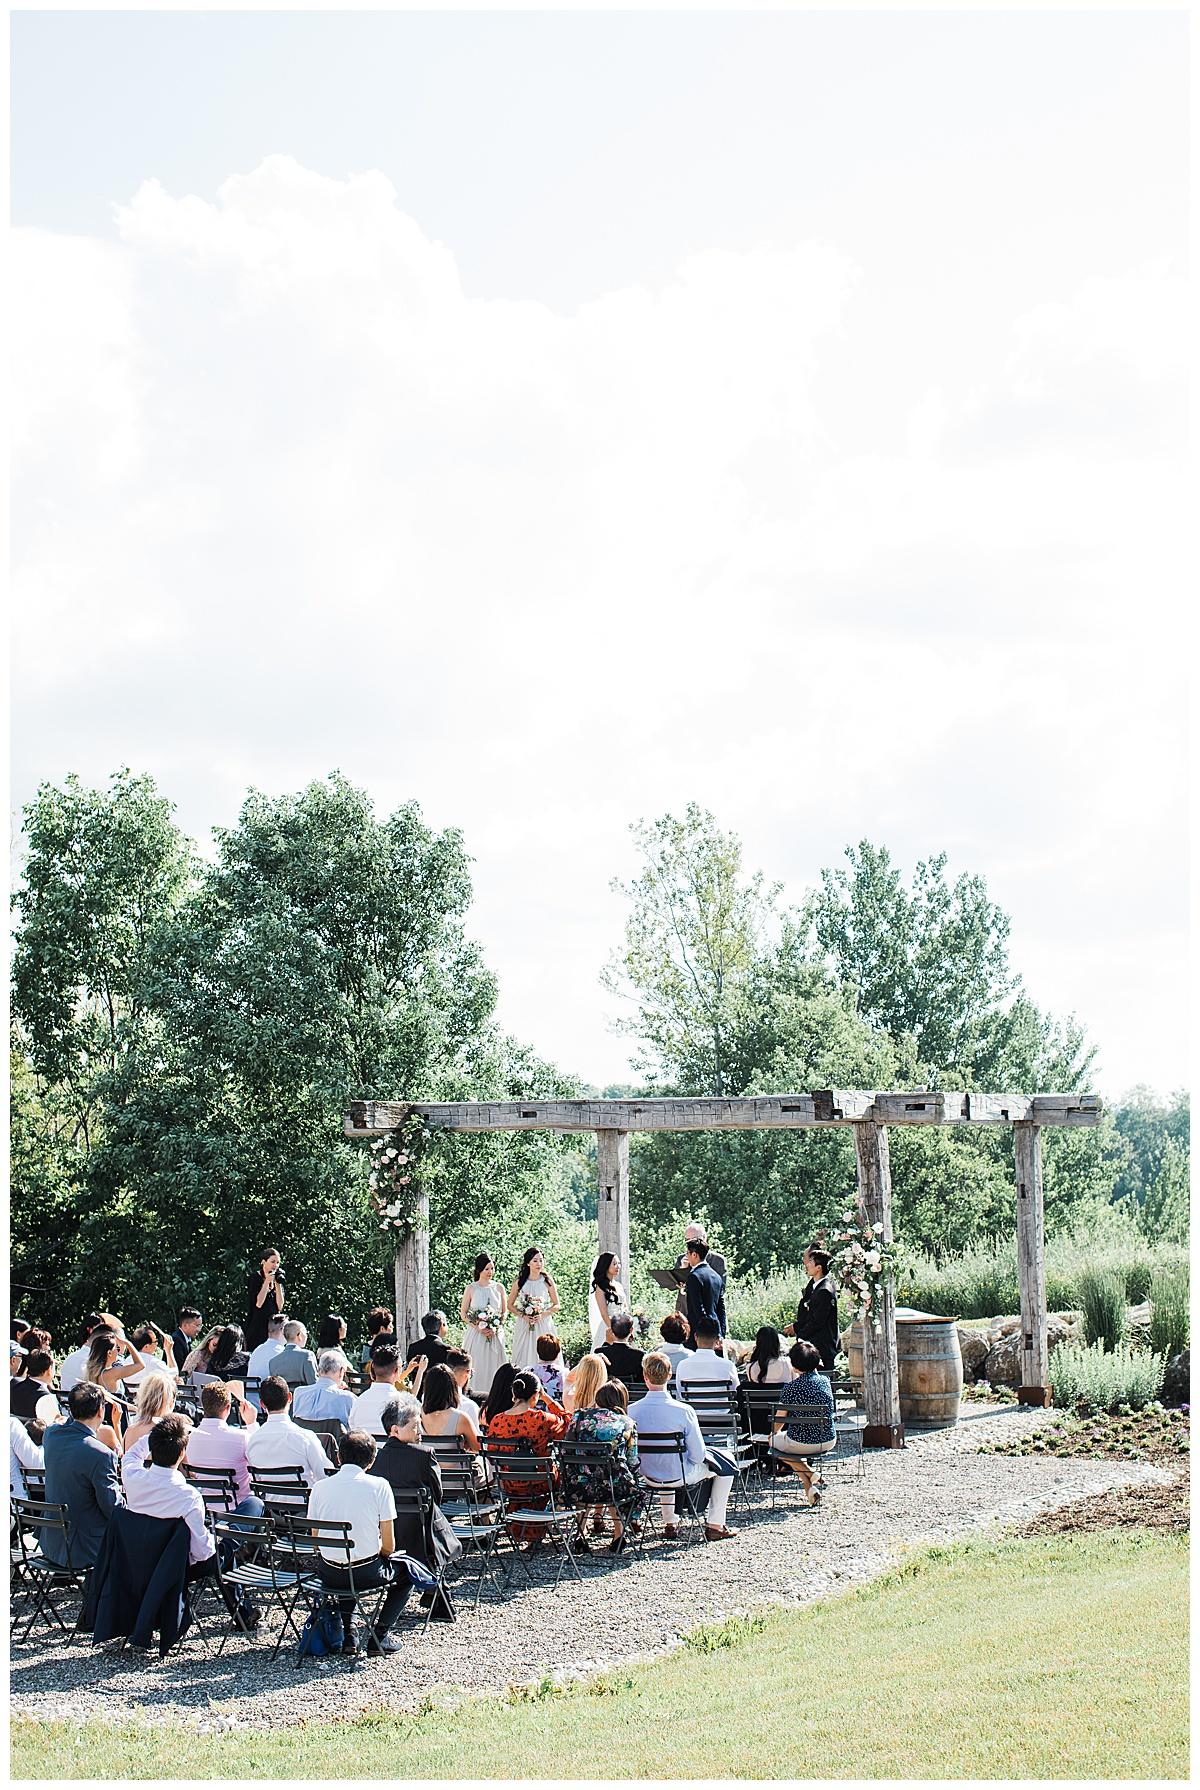 Wedding ceremony at winery| outdoor wedding| pergola wedding ceremony| Toronto photographer| 3photography